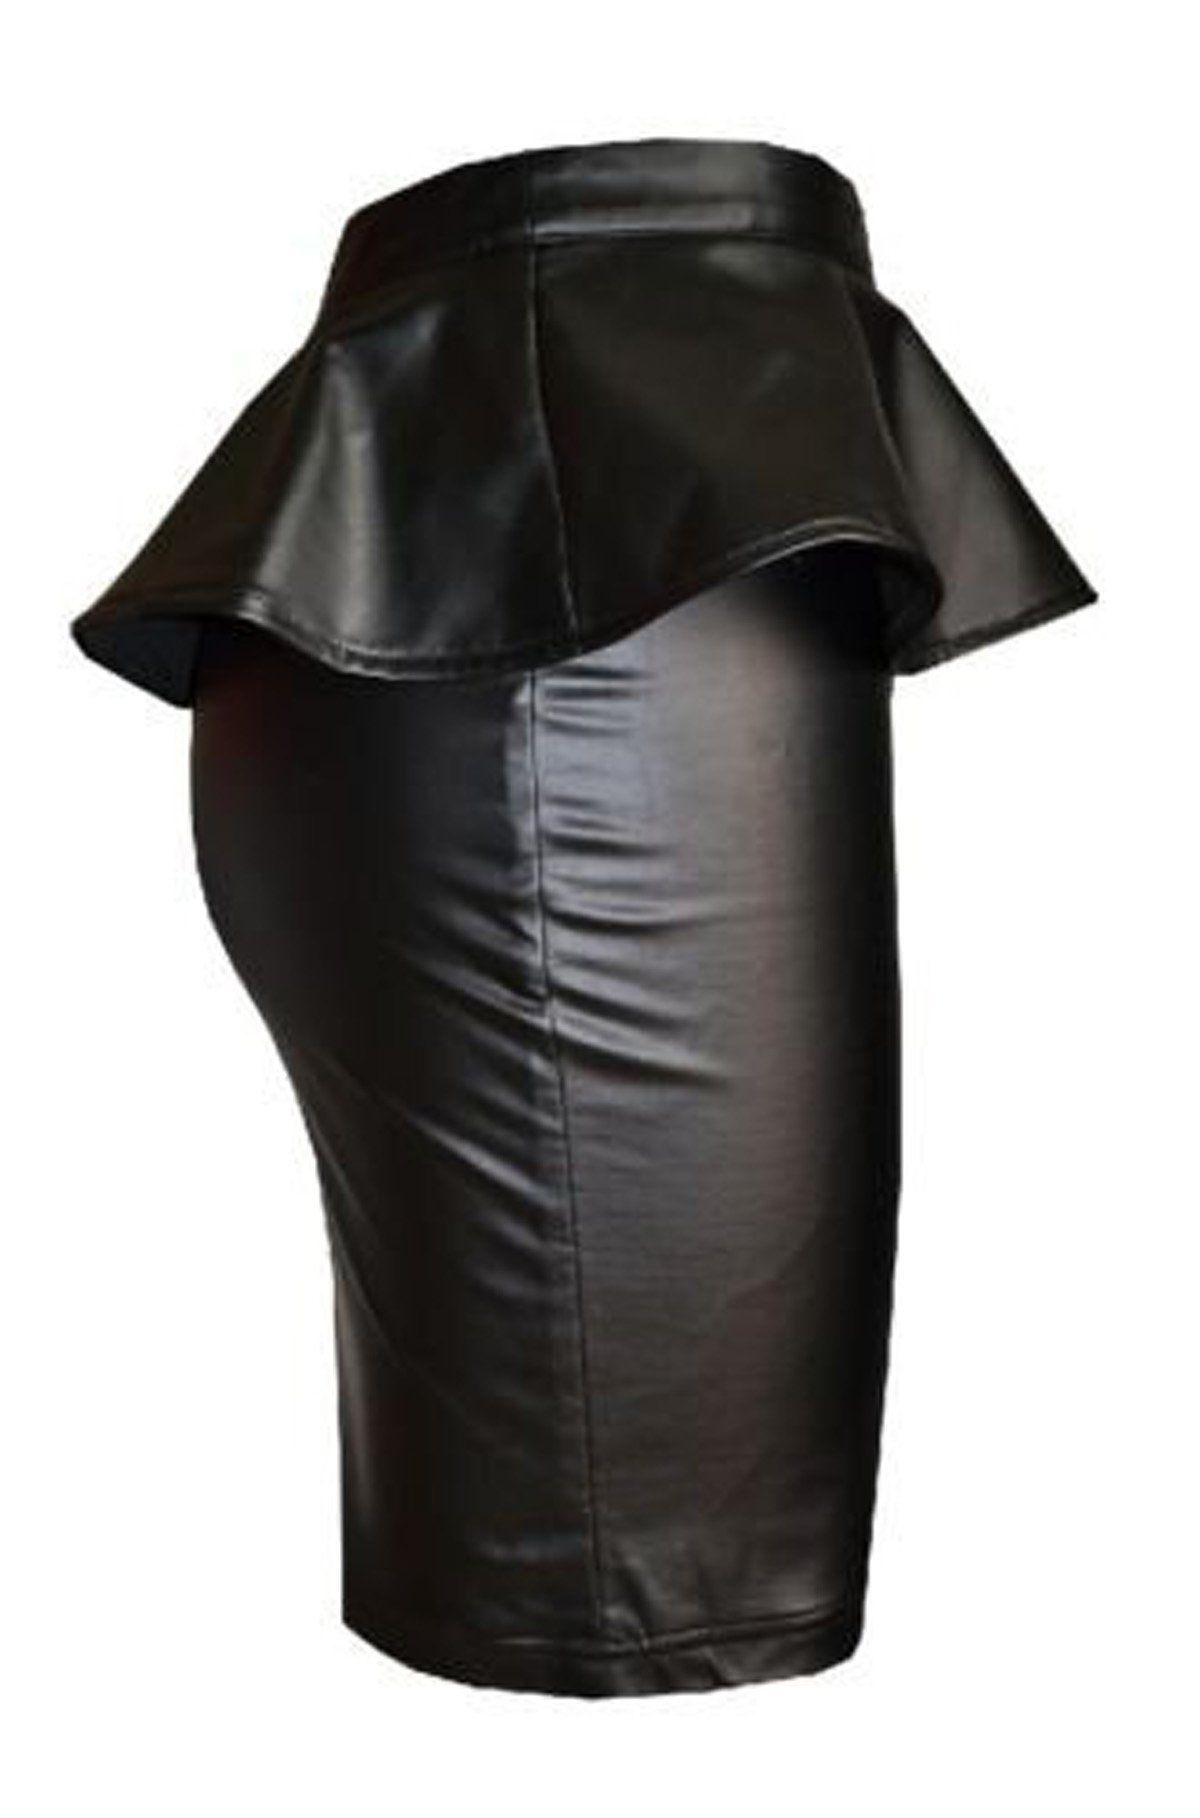 fd48bbca98 Fashion Mark - Womens Plus Size Wet Look Peplum Pencil Skirt Ladies  Celebrity PVC Leather Skirt - Black - Sizes 8-24 (SM=8/10, Black):  Amazon.co.uk: ...